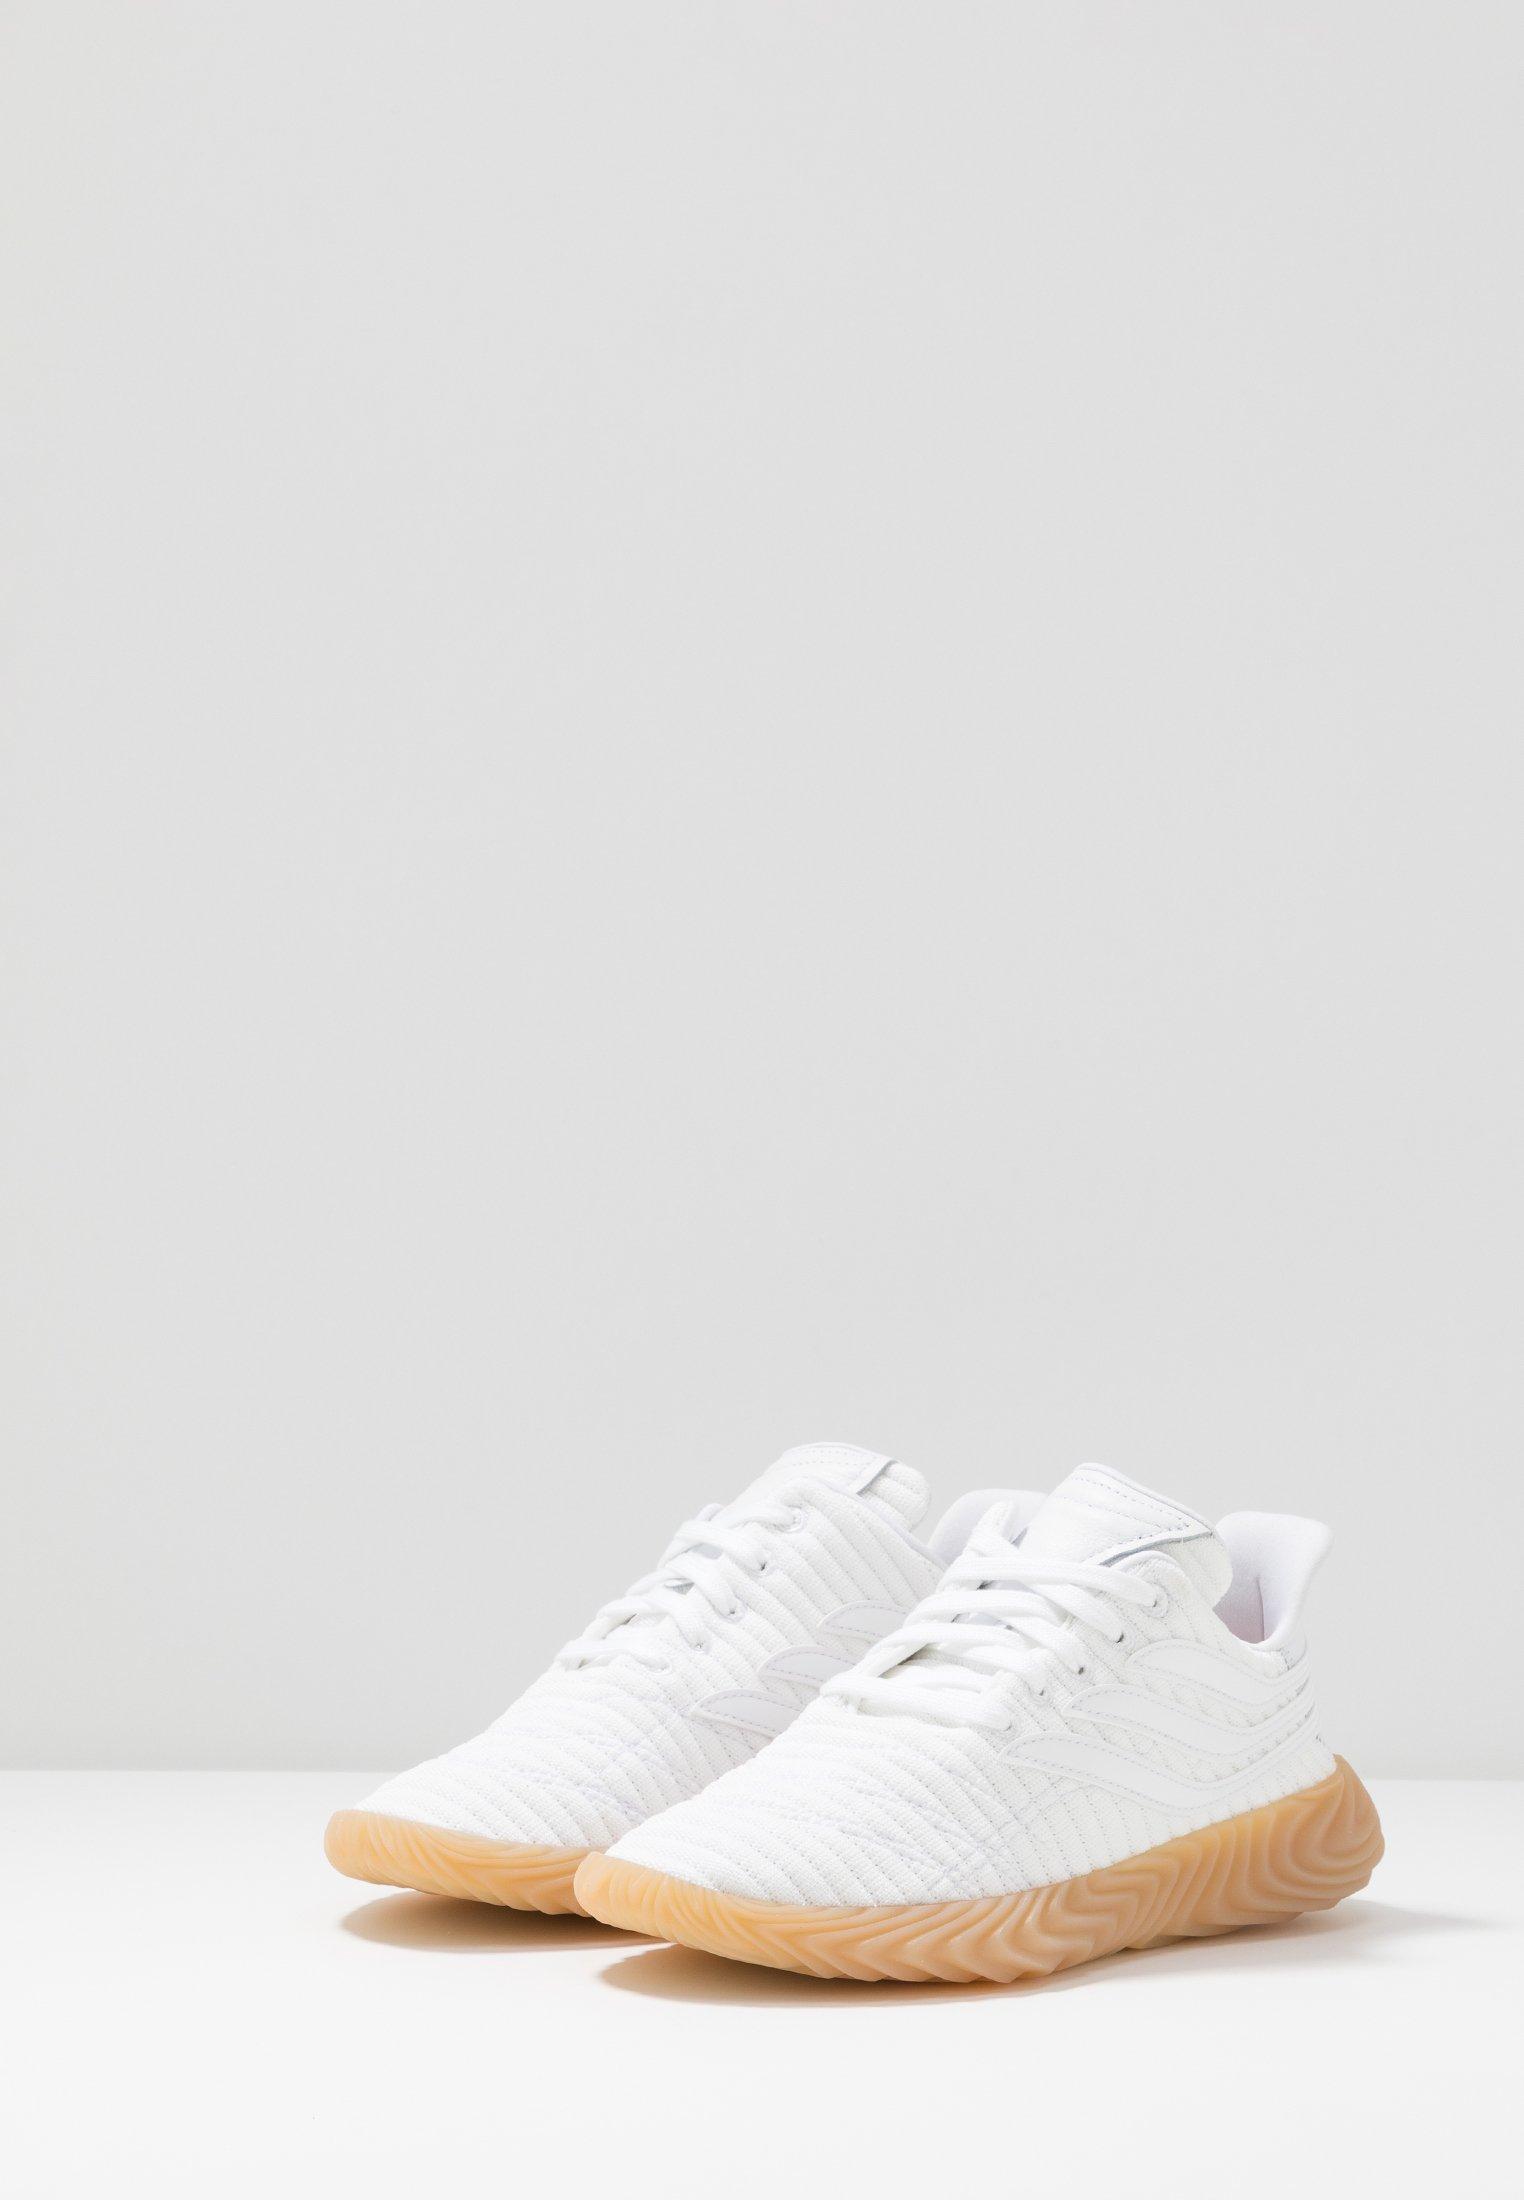 Originals SobakovBaskets White Adidas Basses Footwear doWCxBre